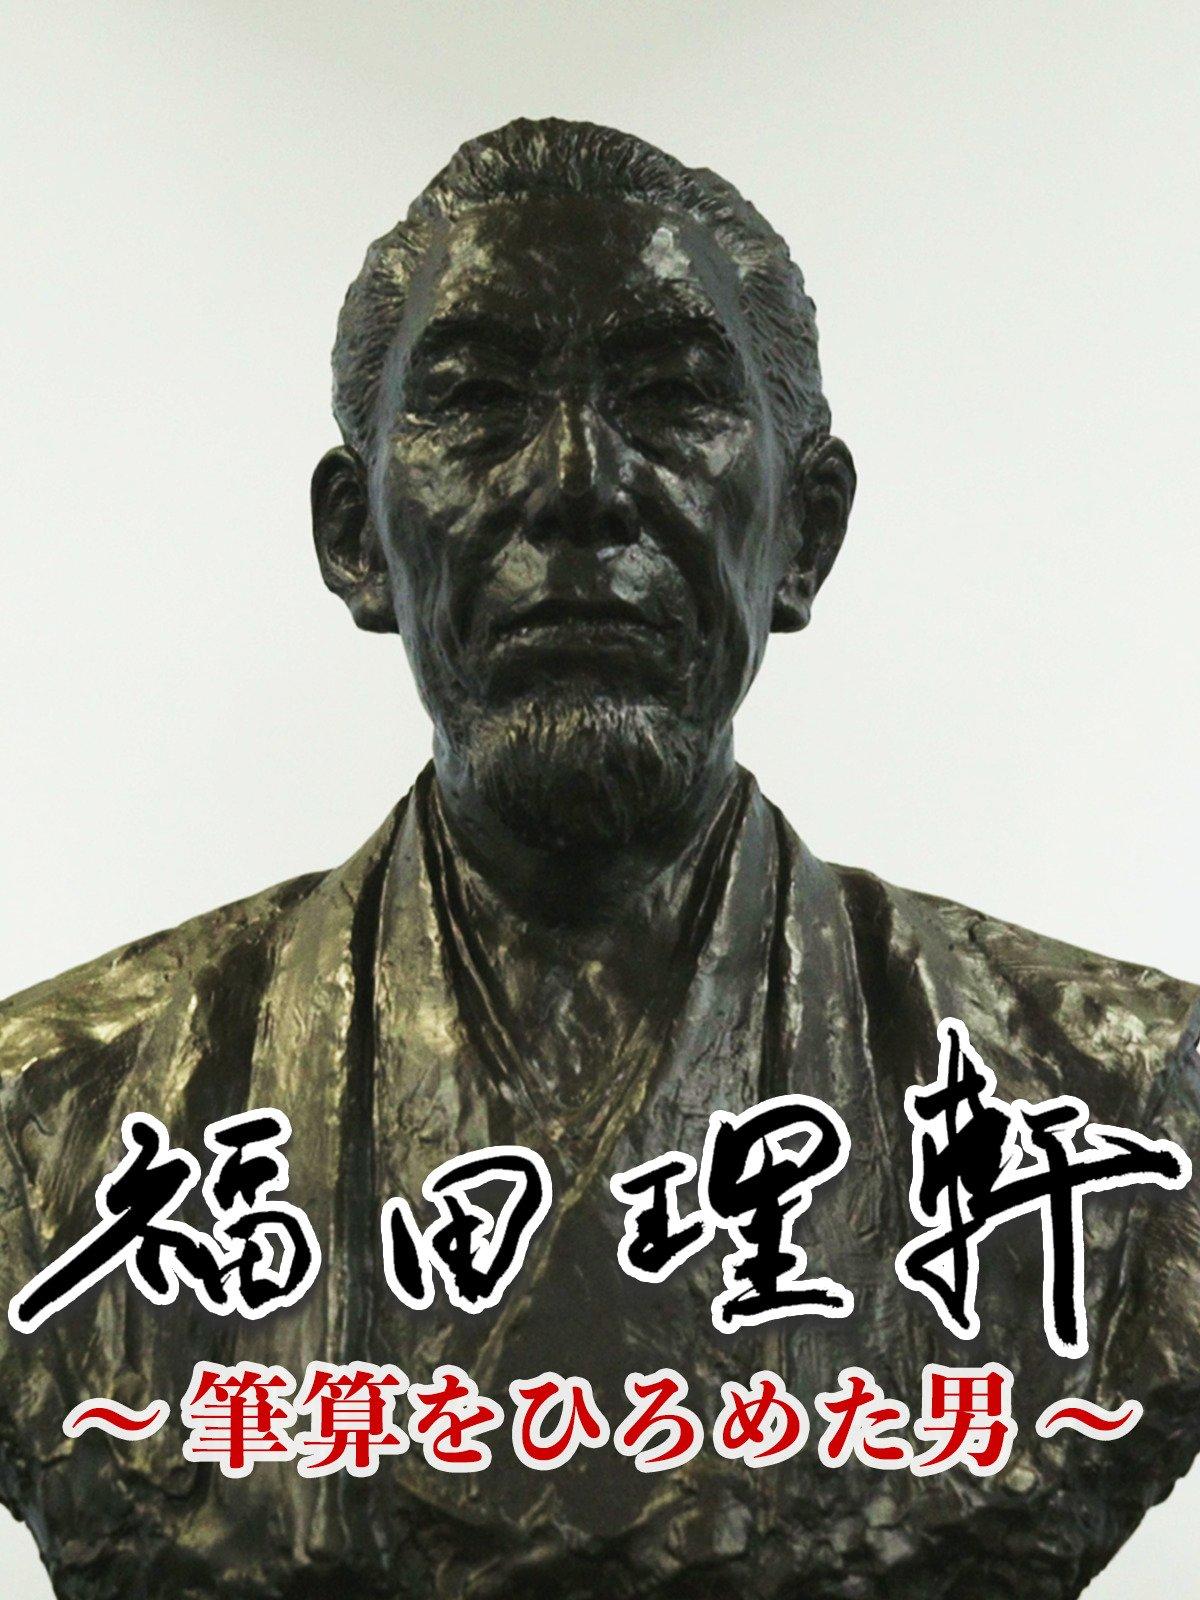 Amazon.co.jp: 福田理軒〜筆算をひろめた男〜を観る | Prime Video